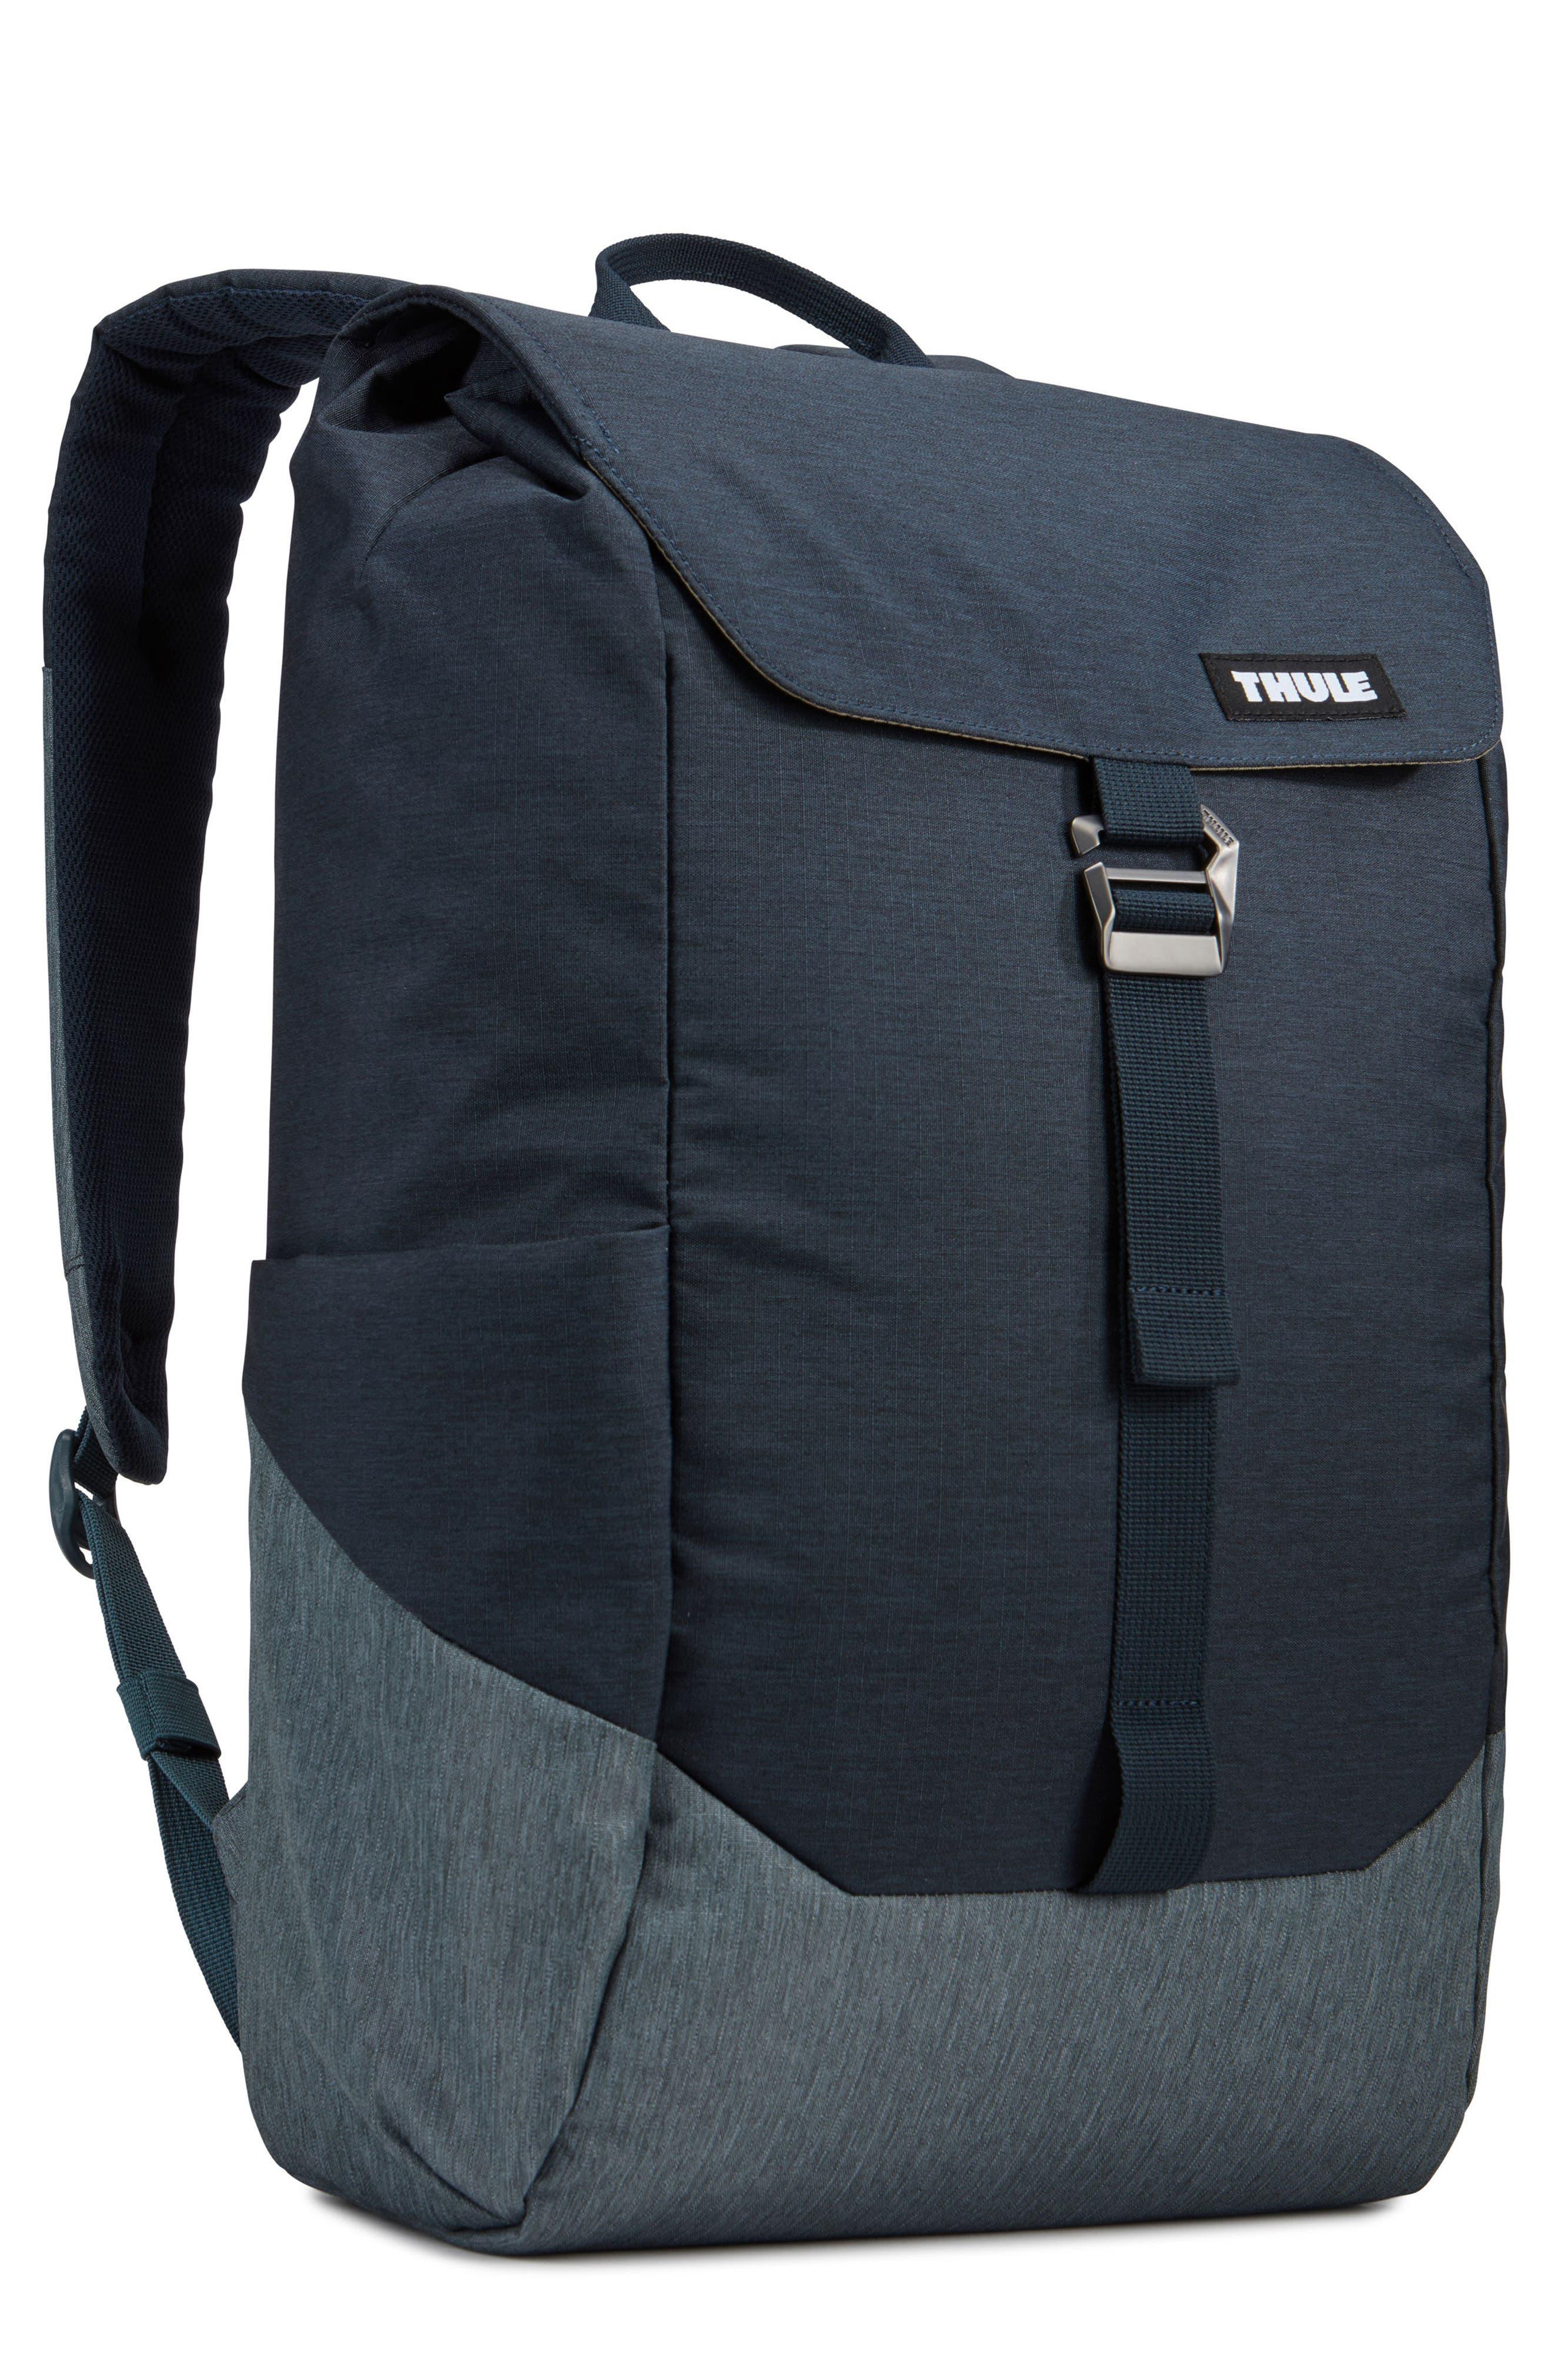 Thule Lithos Backpack (16L)